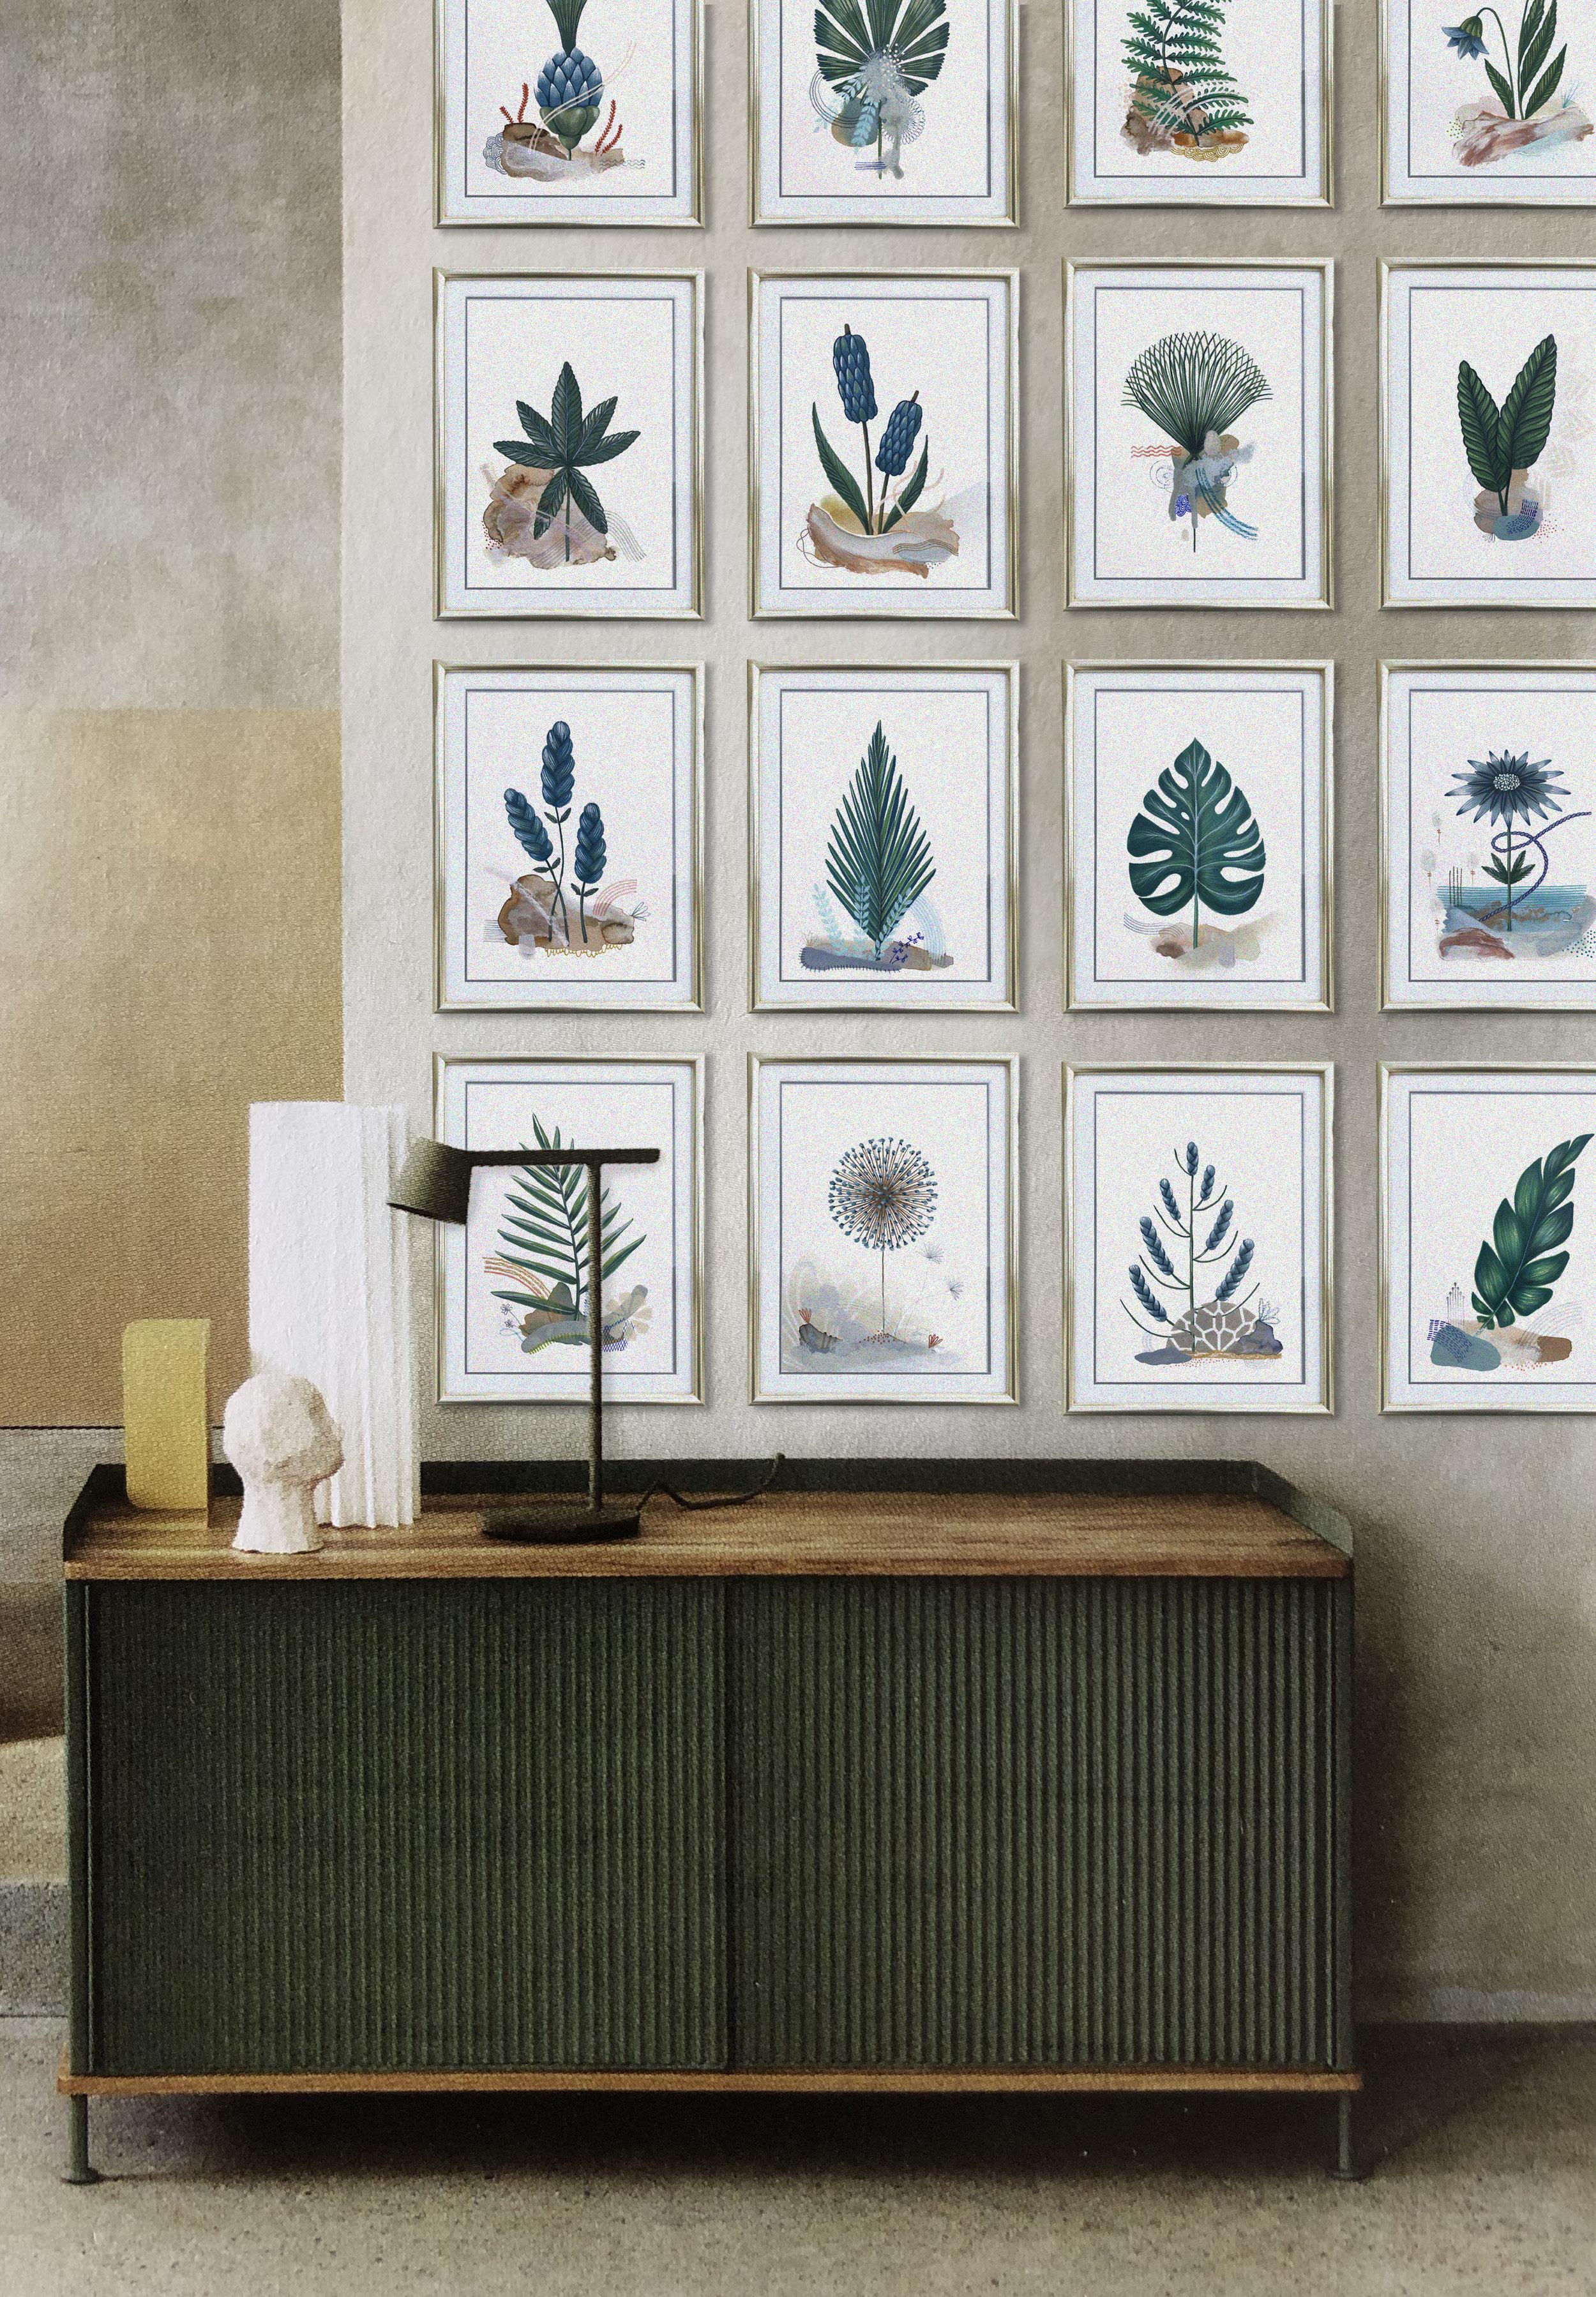 Botanic Garden  Imaginary Herbarium, serie of 66 dessins A5 - Mix medi | 2018 *  Photo-montage w/ MILK deco Magazine n°24 - P.19 | Pub   MUUTO